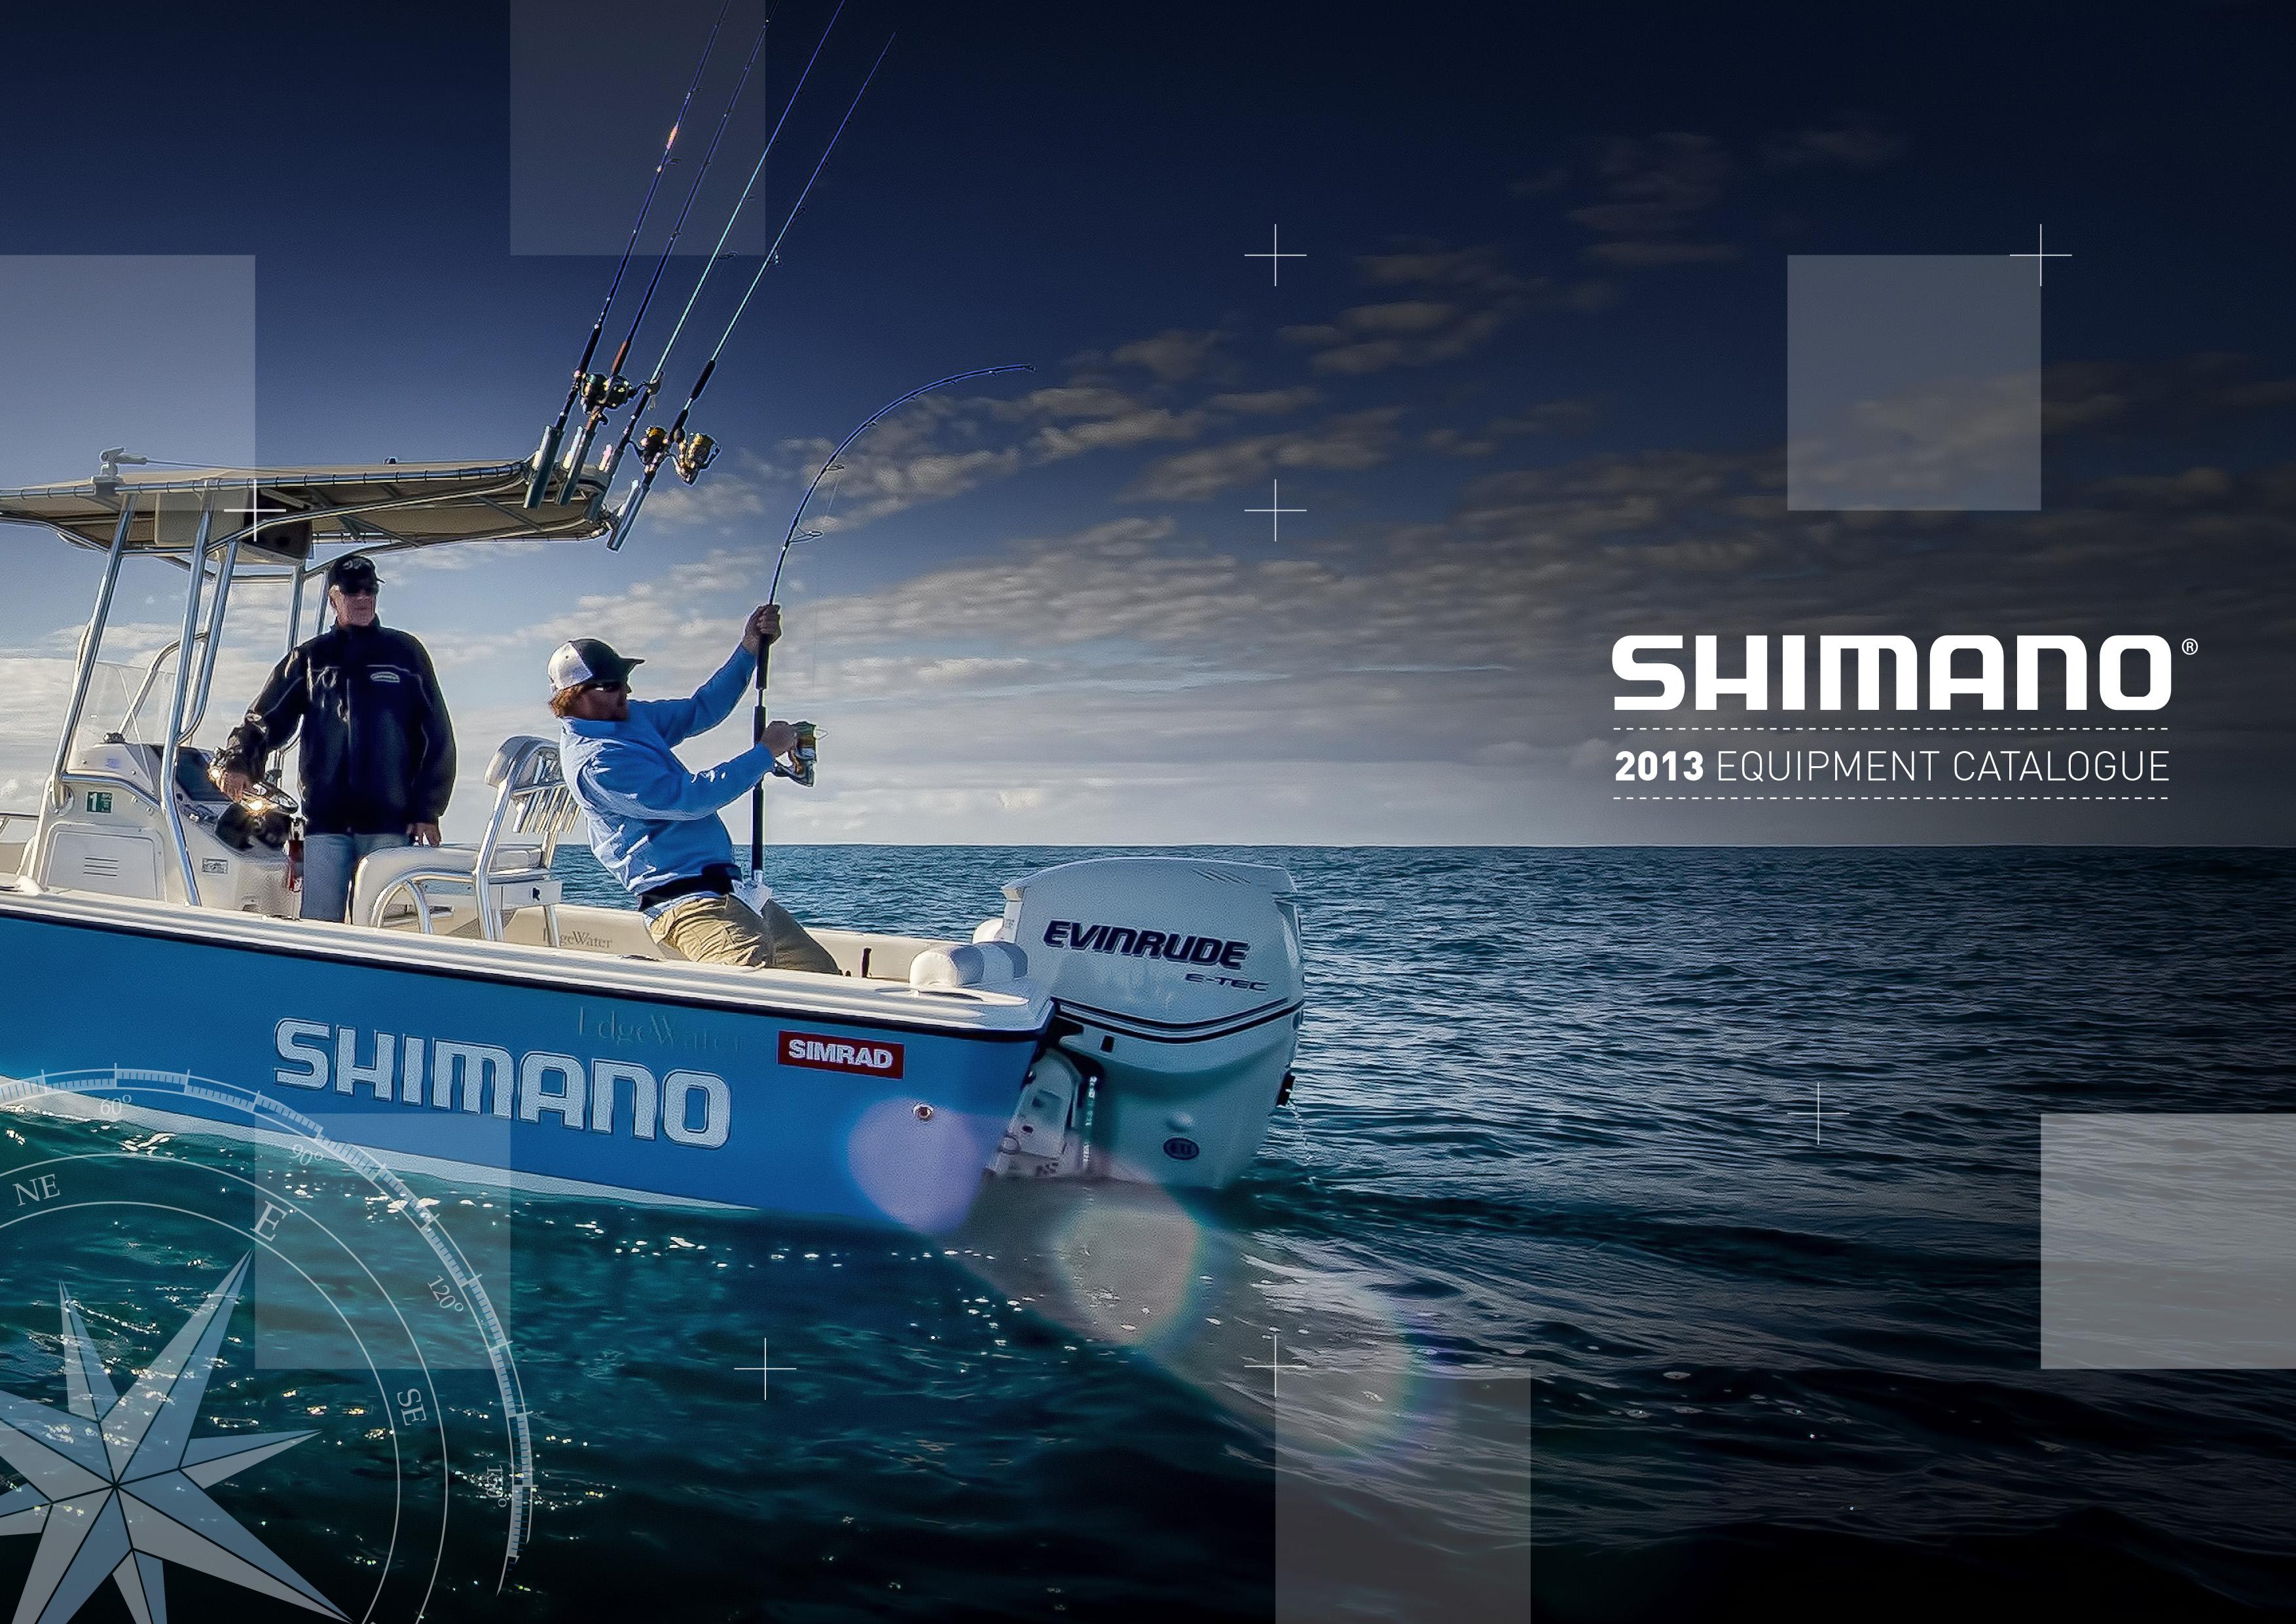 shimano : catalogue 2013 | quadrant communications design, Fishing Reels